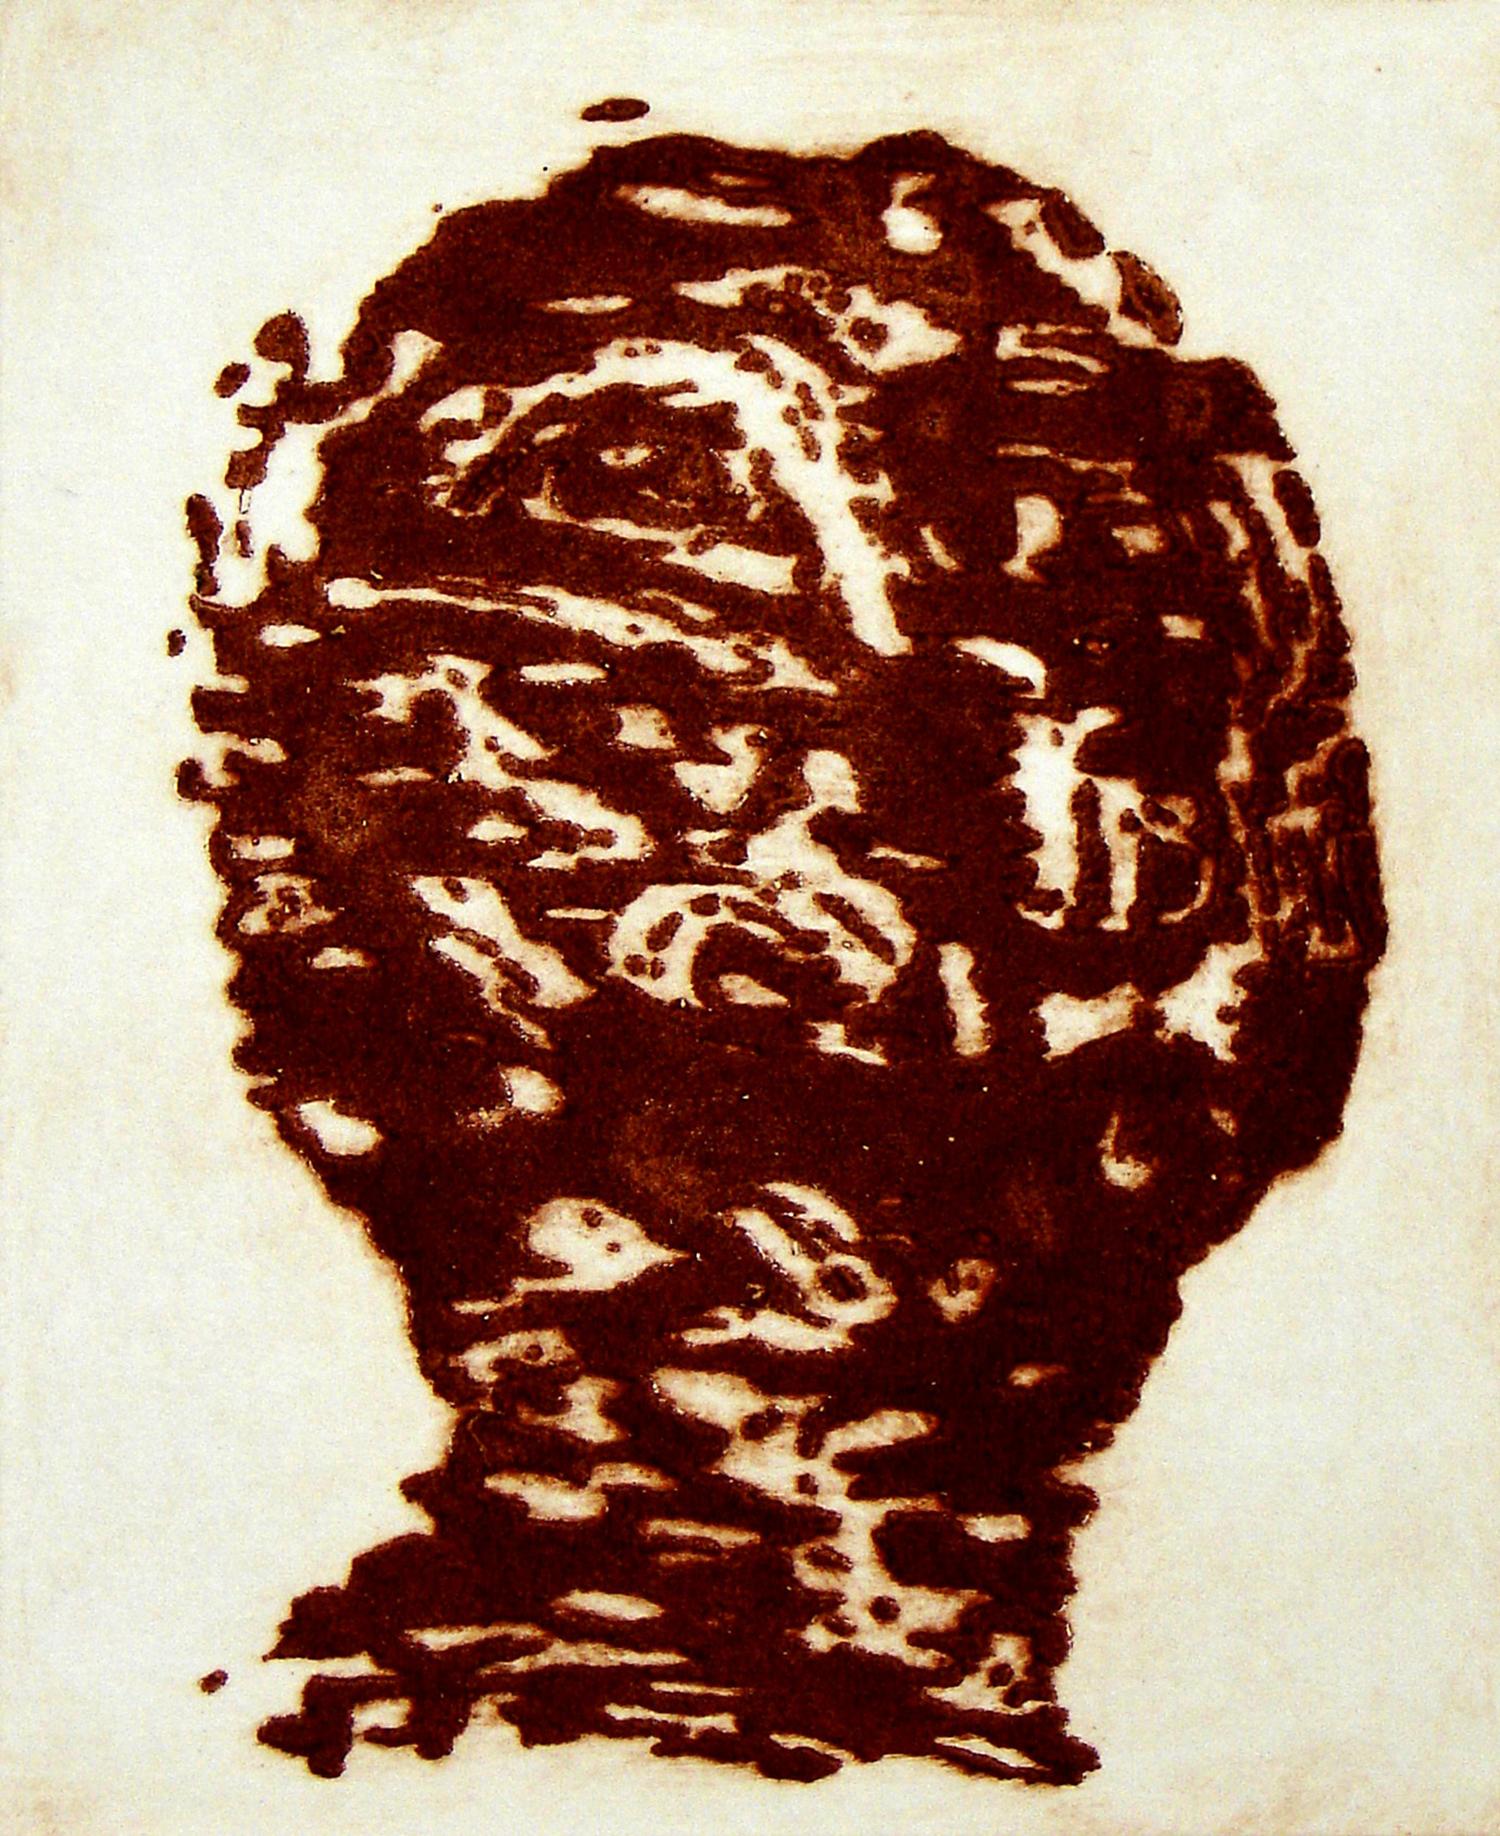 Peter Griffin, Carborundum Head V    Date:  2007   Size (cm - unframed):  45 x 35.5   Technique:  Carborundum Etching   Materials:  Moulin Du Gue 300gsm   Edition size:  6   Publisher:  The Artist   Copyright:  The Artist    P.O.A.